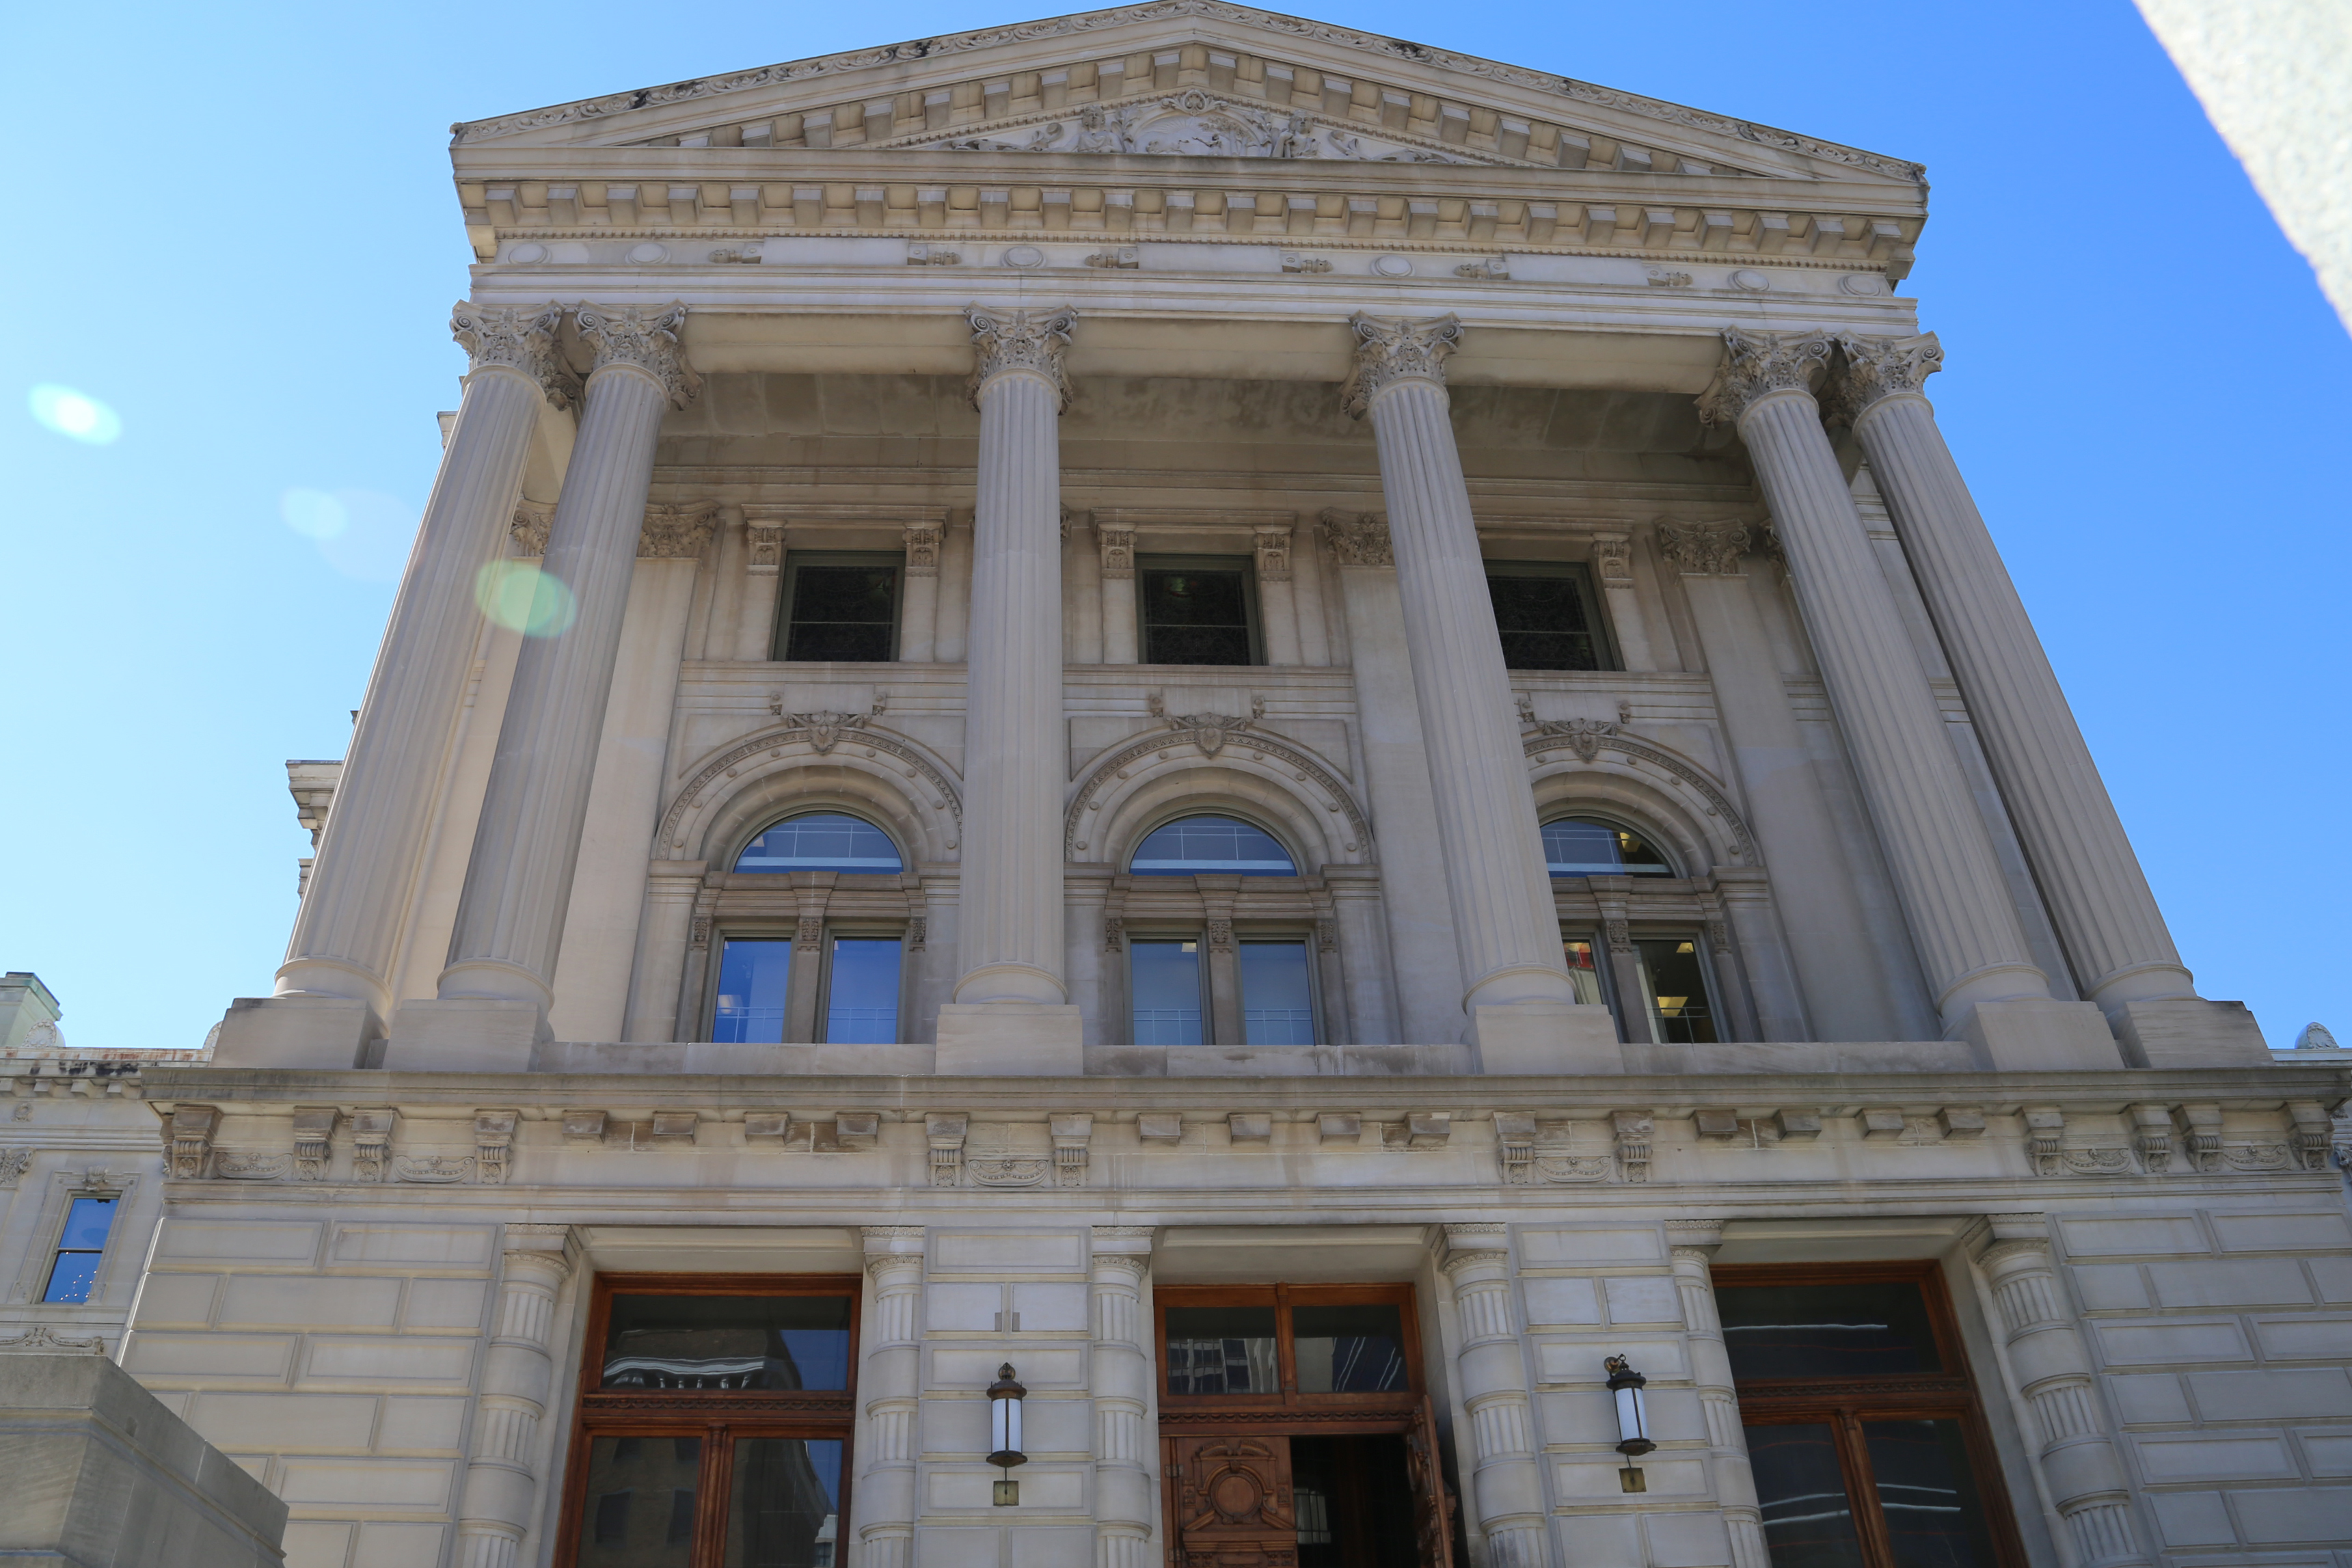 Statehouse main entrance